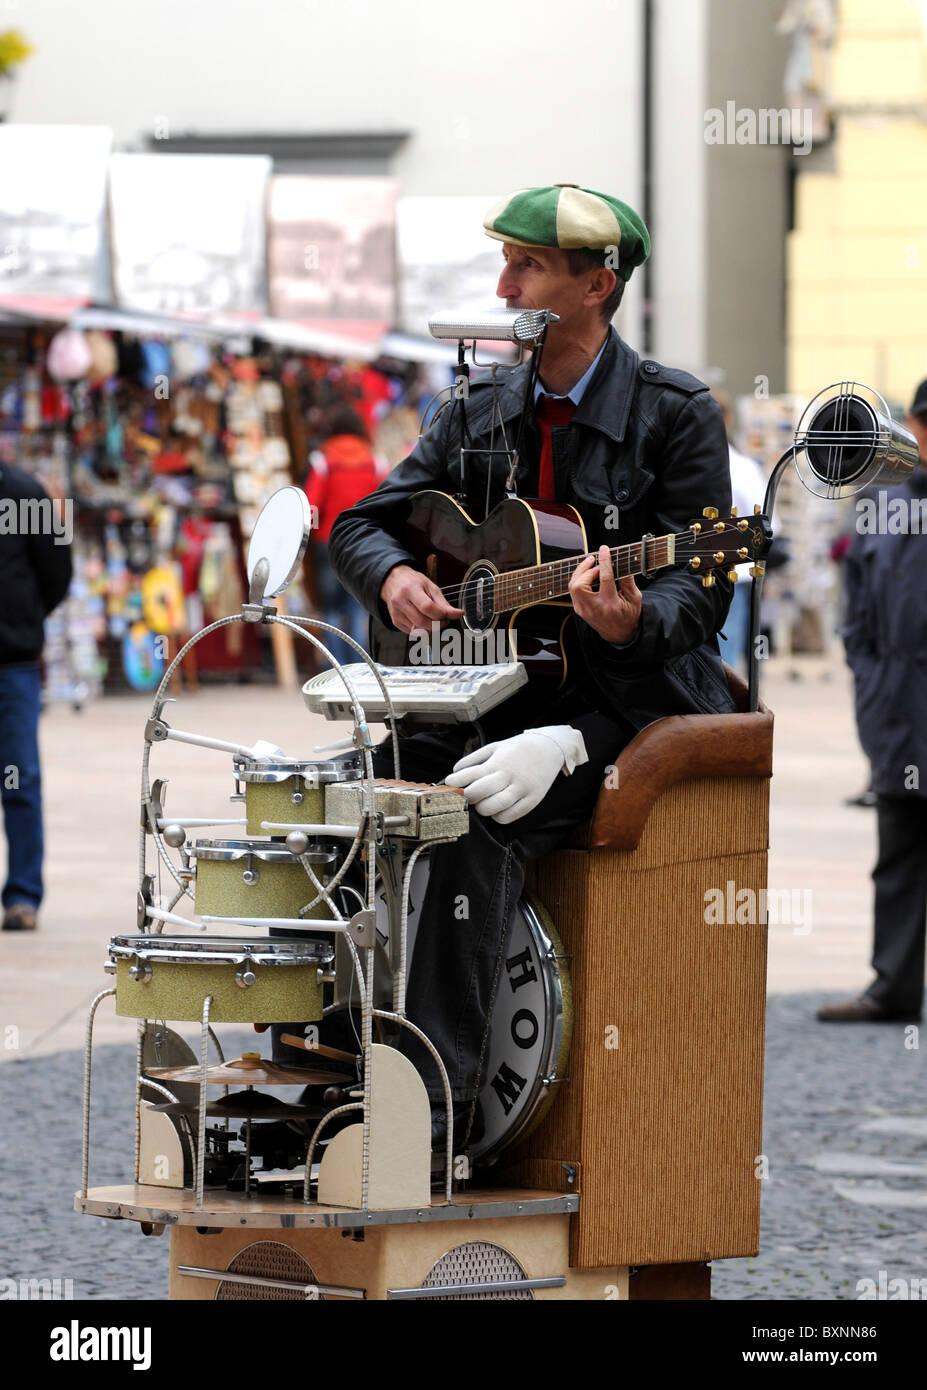 Street entertainer, Bratislava, Slovakia, Europe - Stock Image